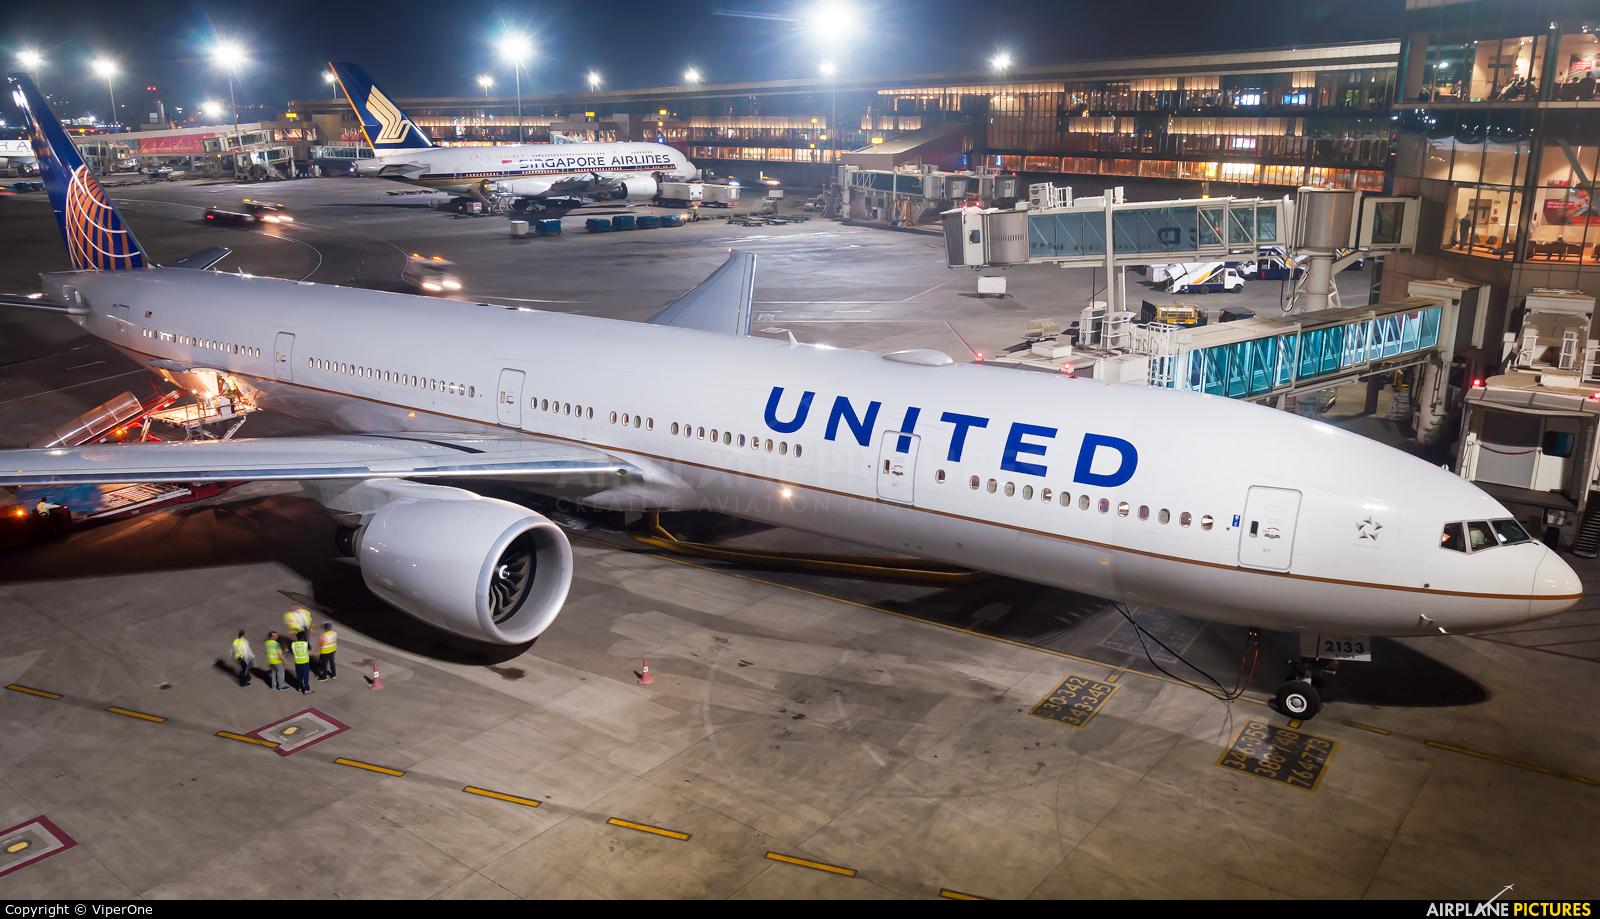 United Airlines N2333U aircraft at Mumbai - Chhatrapati Shivaji Intl